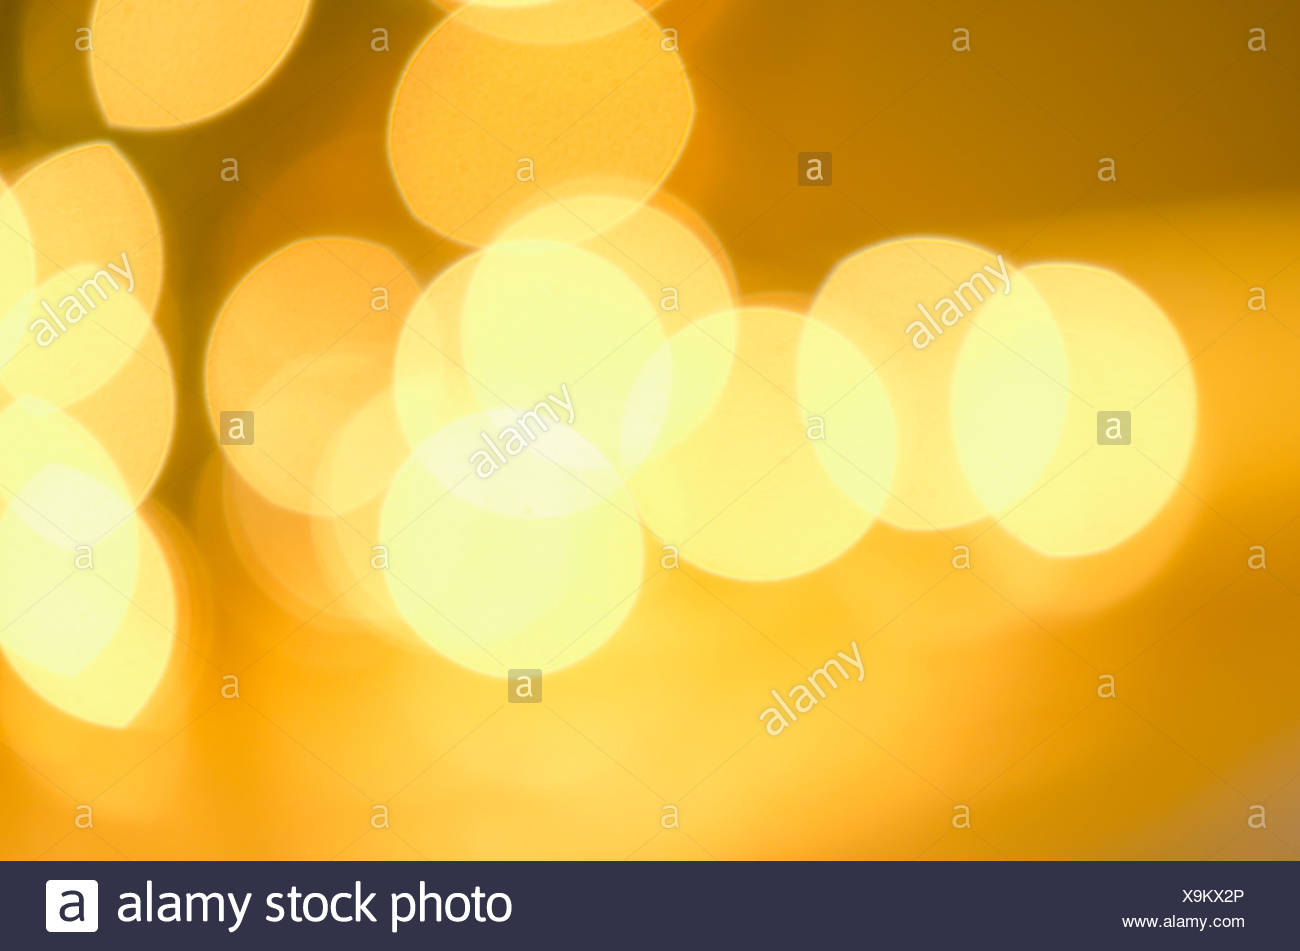 Glowing background, studio shot - Stock Image